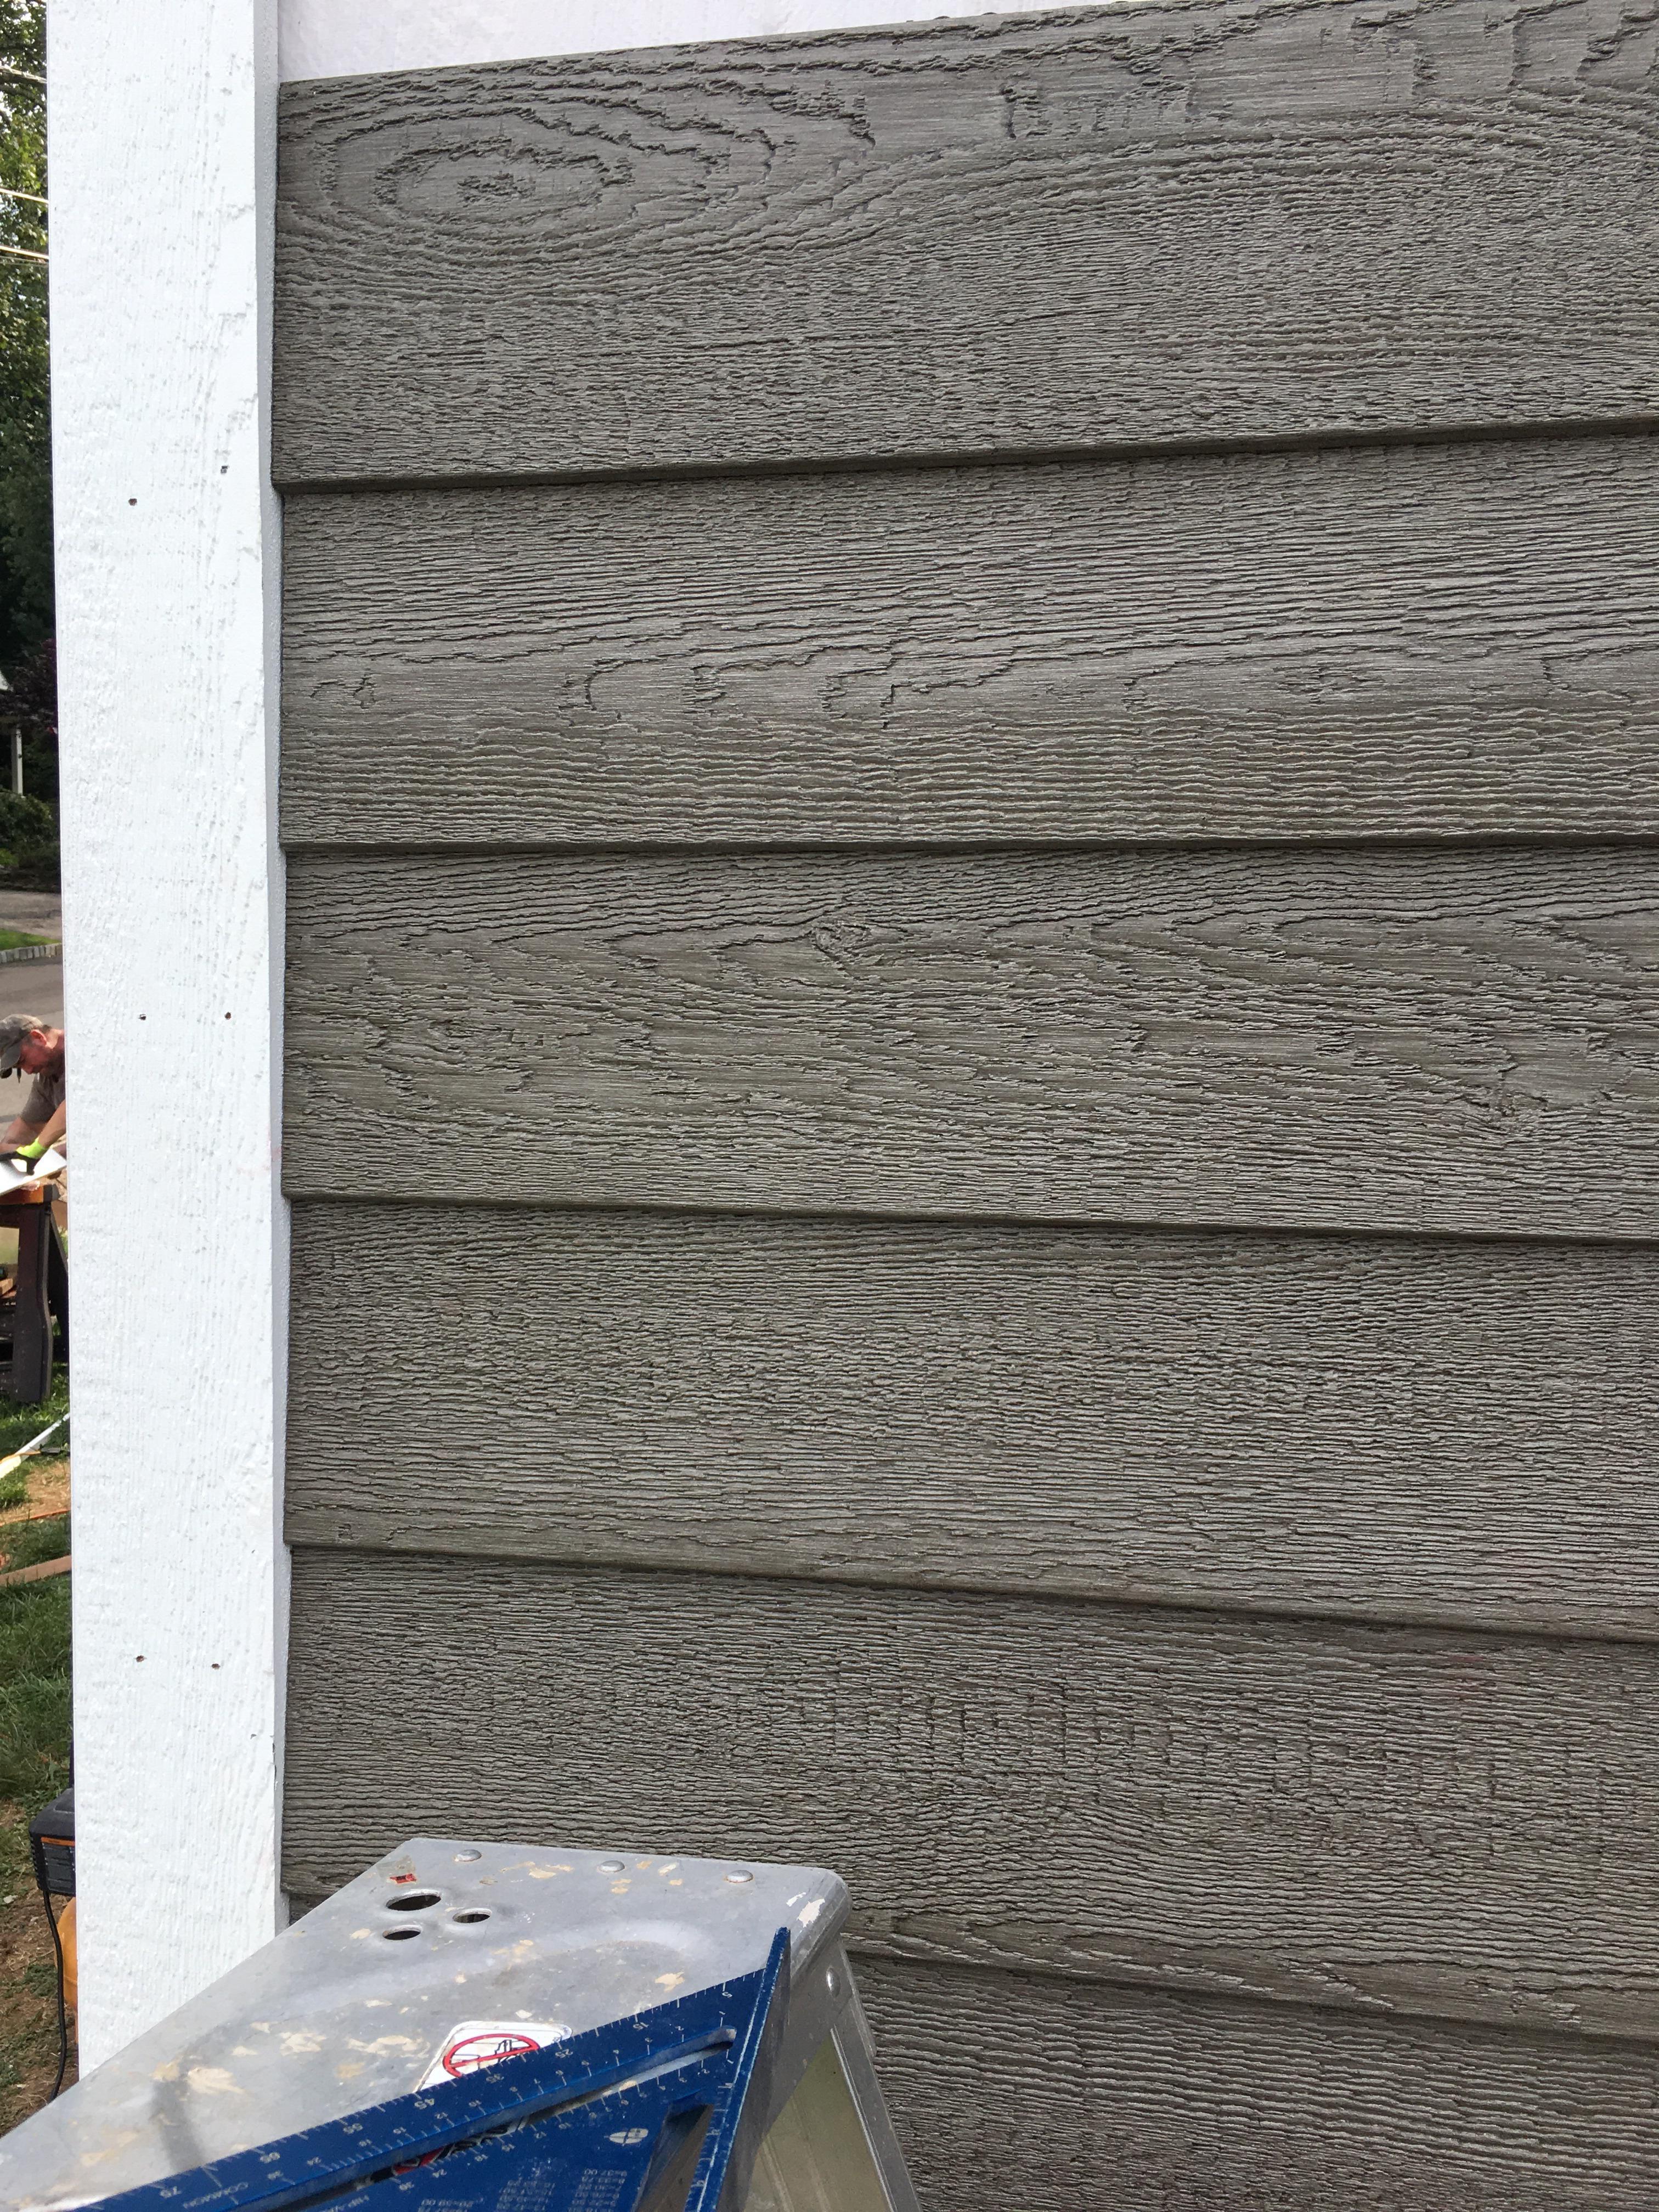 Eco Side Siding Options Wood Grain Siding Products Engineered Wood Siding Metal Siding House Siding Options